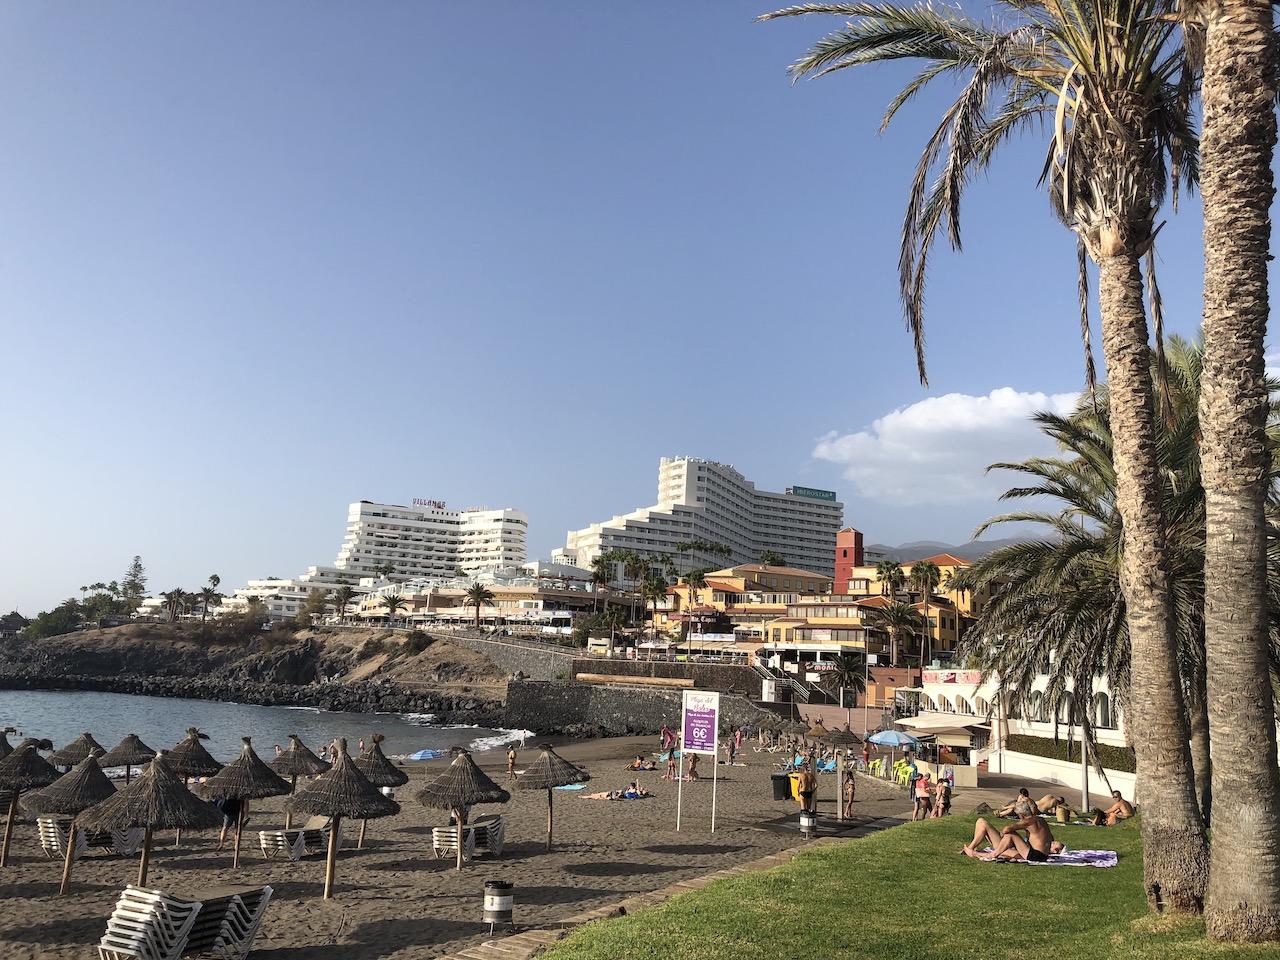 Iberostar Bouganville Playa hotel from Bobo beach